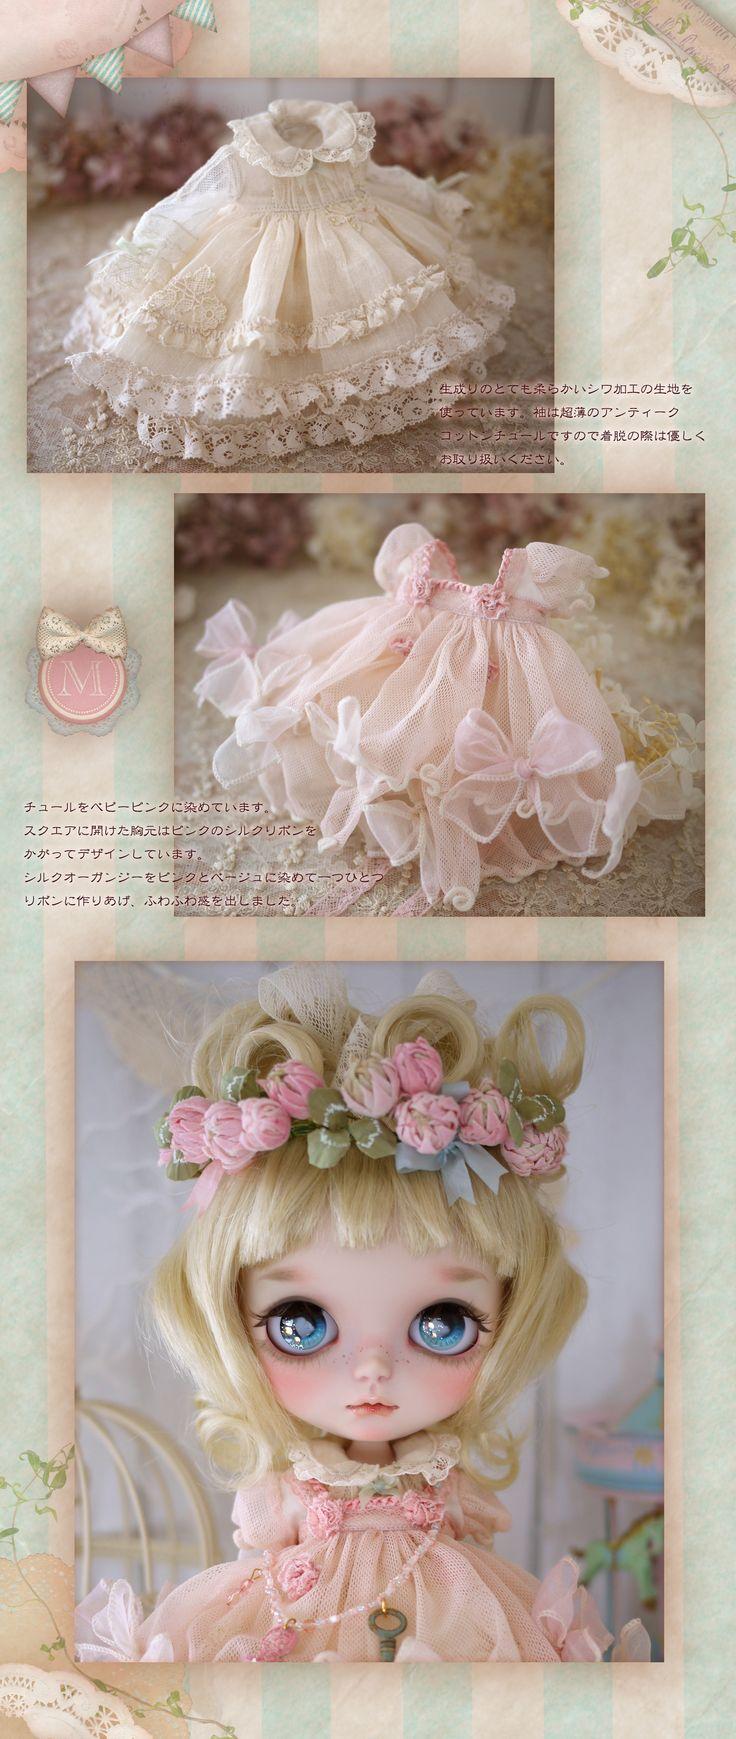 ** Milk Tea ** custom Blythe * haru white clover * Admin - Auction - Rinkya! Japan Auction & Shopping